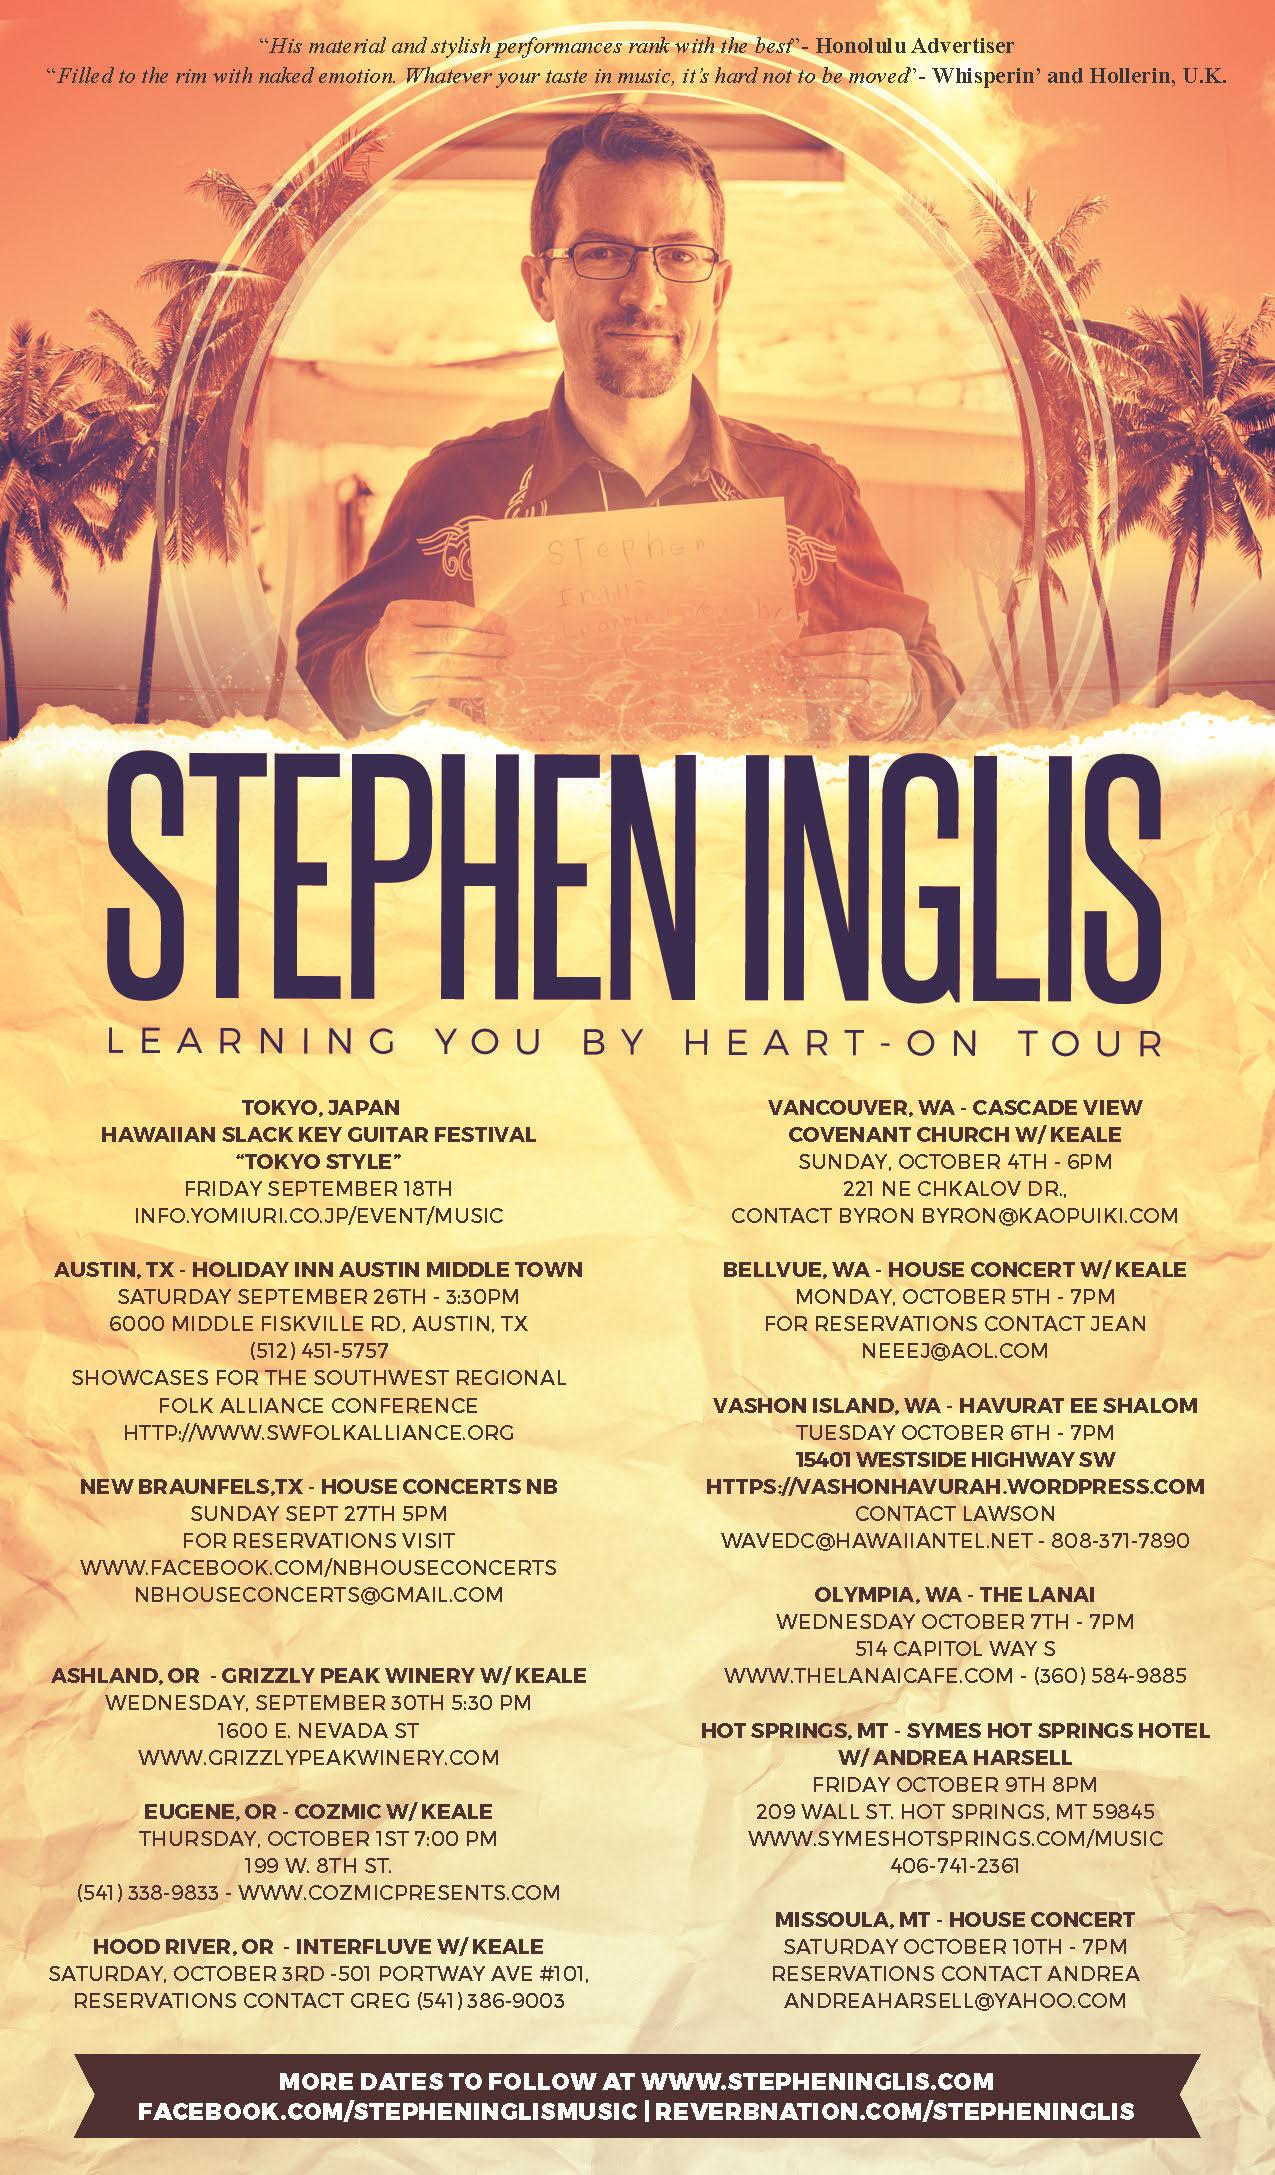 Stephen_Inglis_SEPOCT_Tour_2015